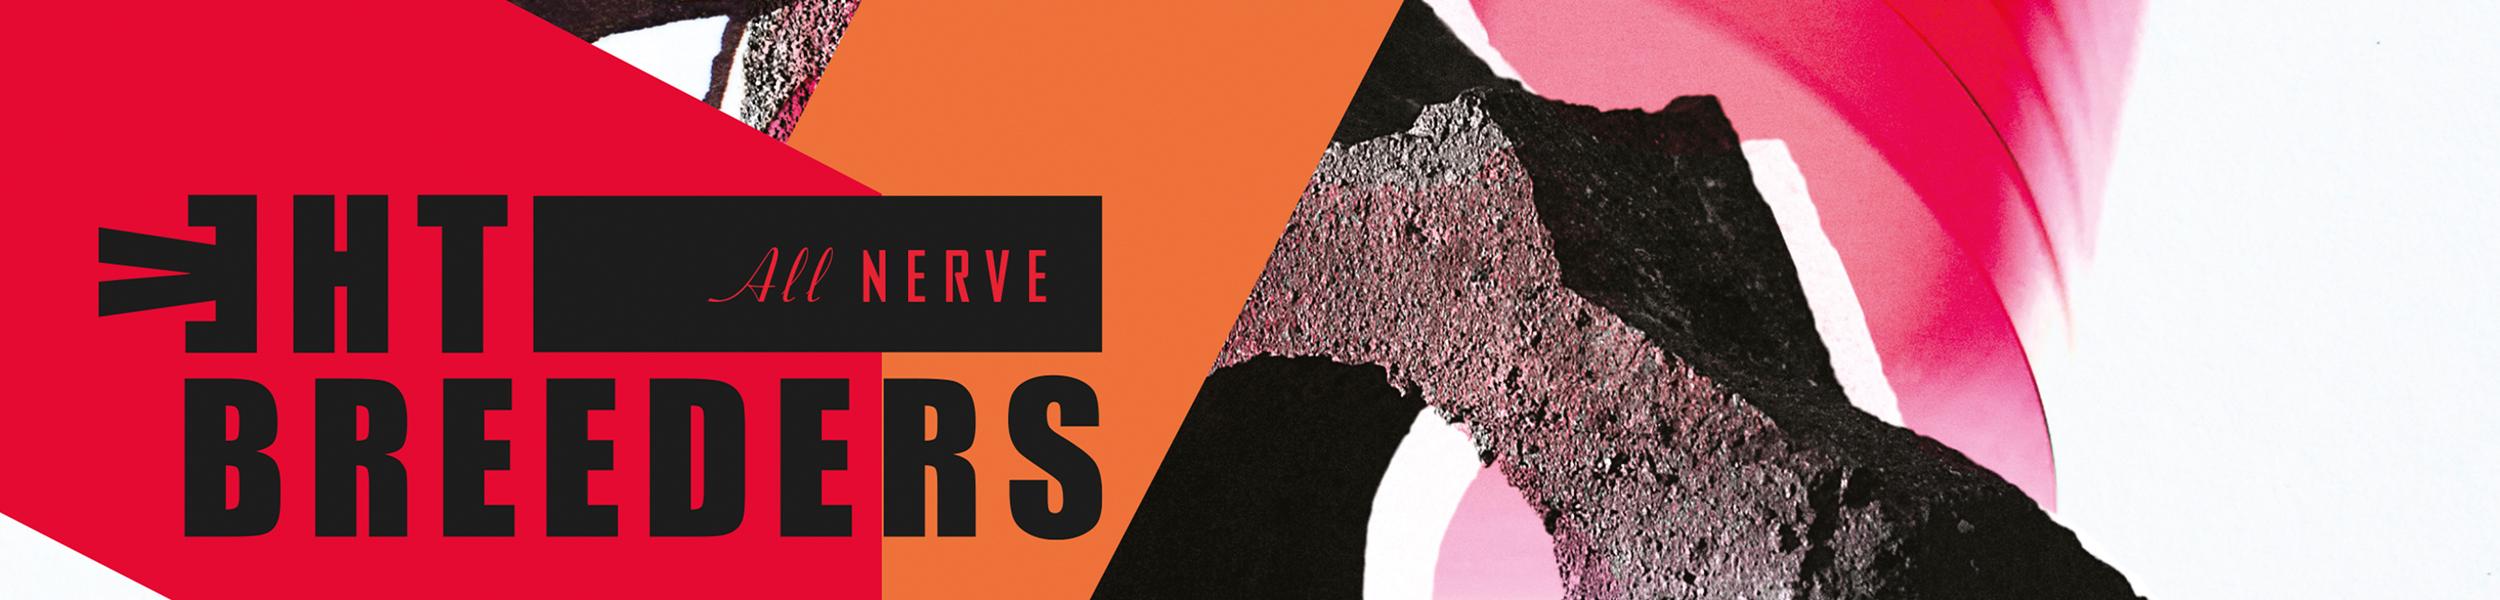 The Breeders - New Album, 'All Nerve'